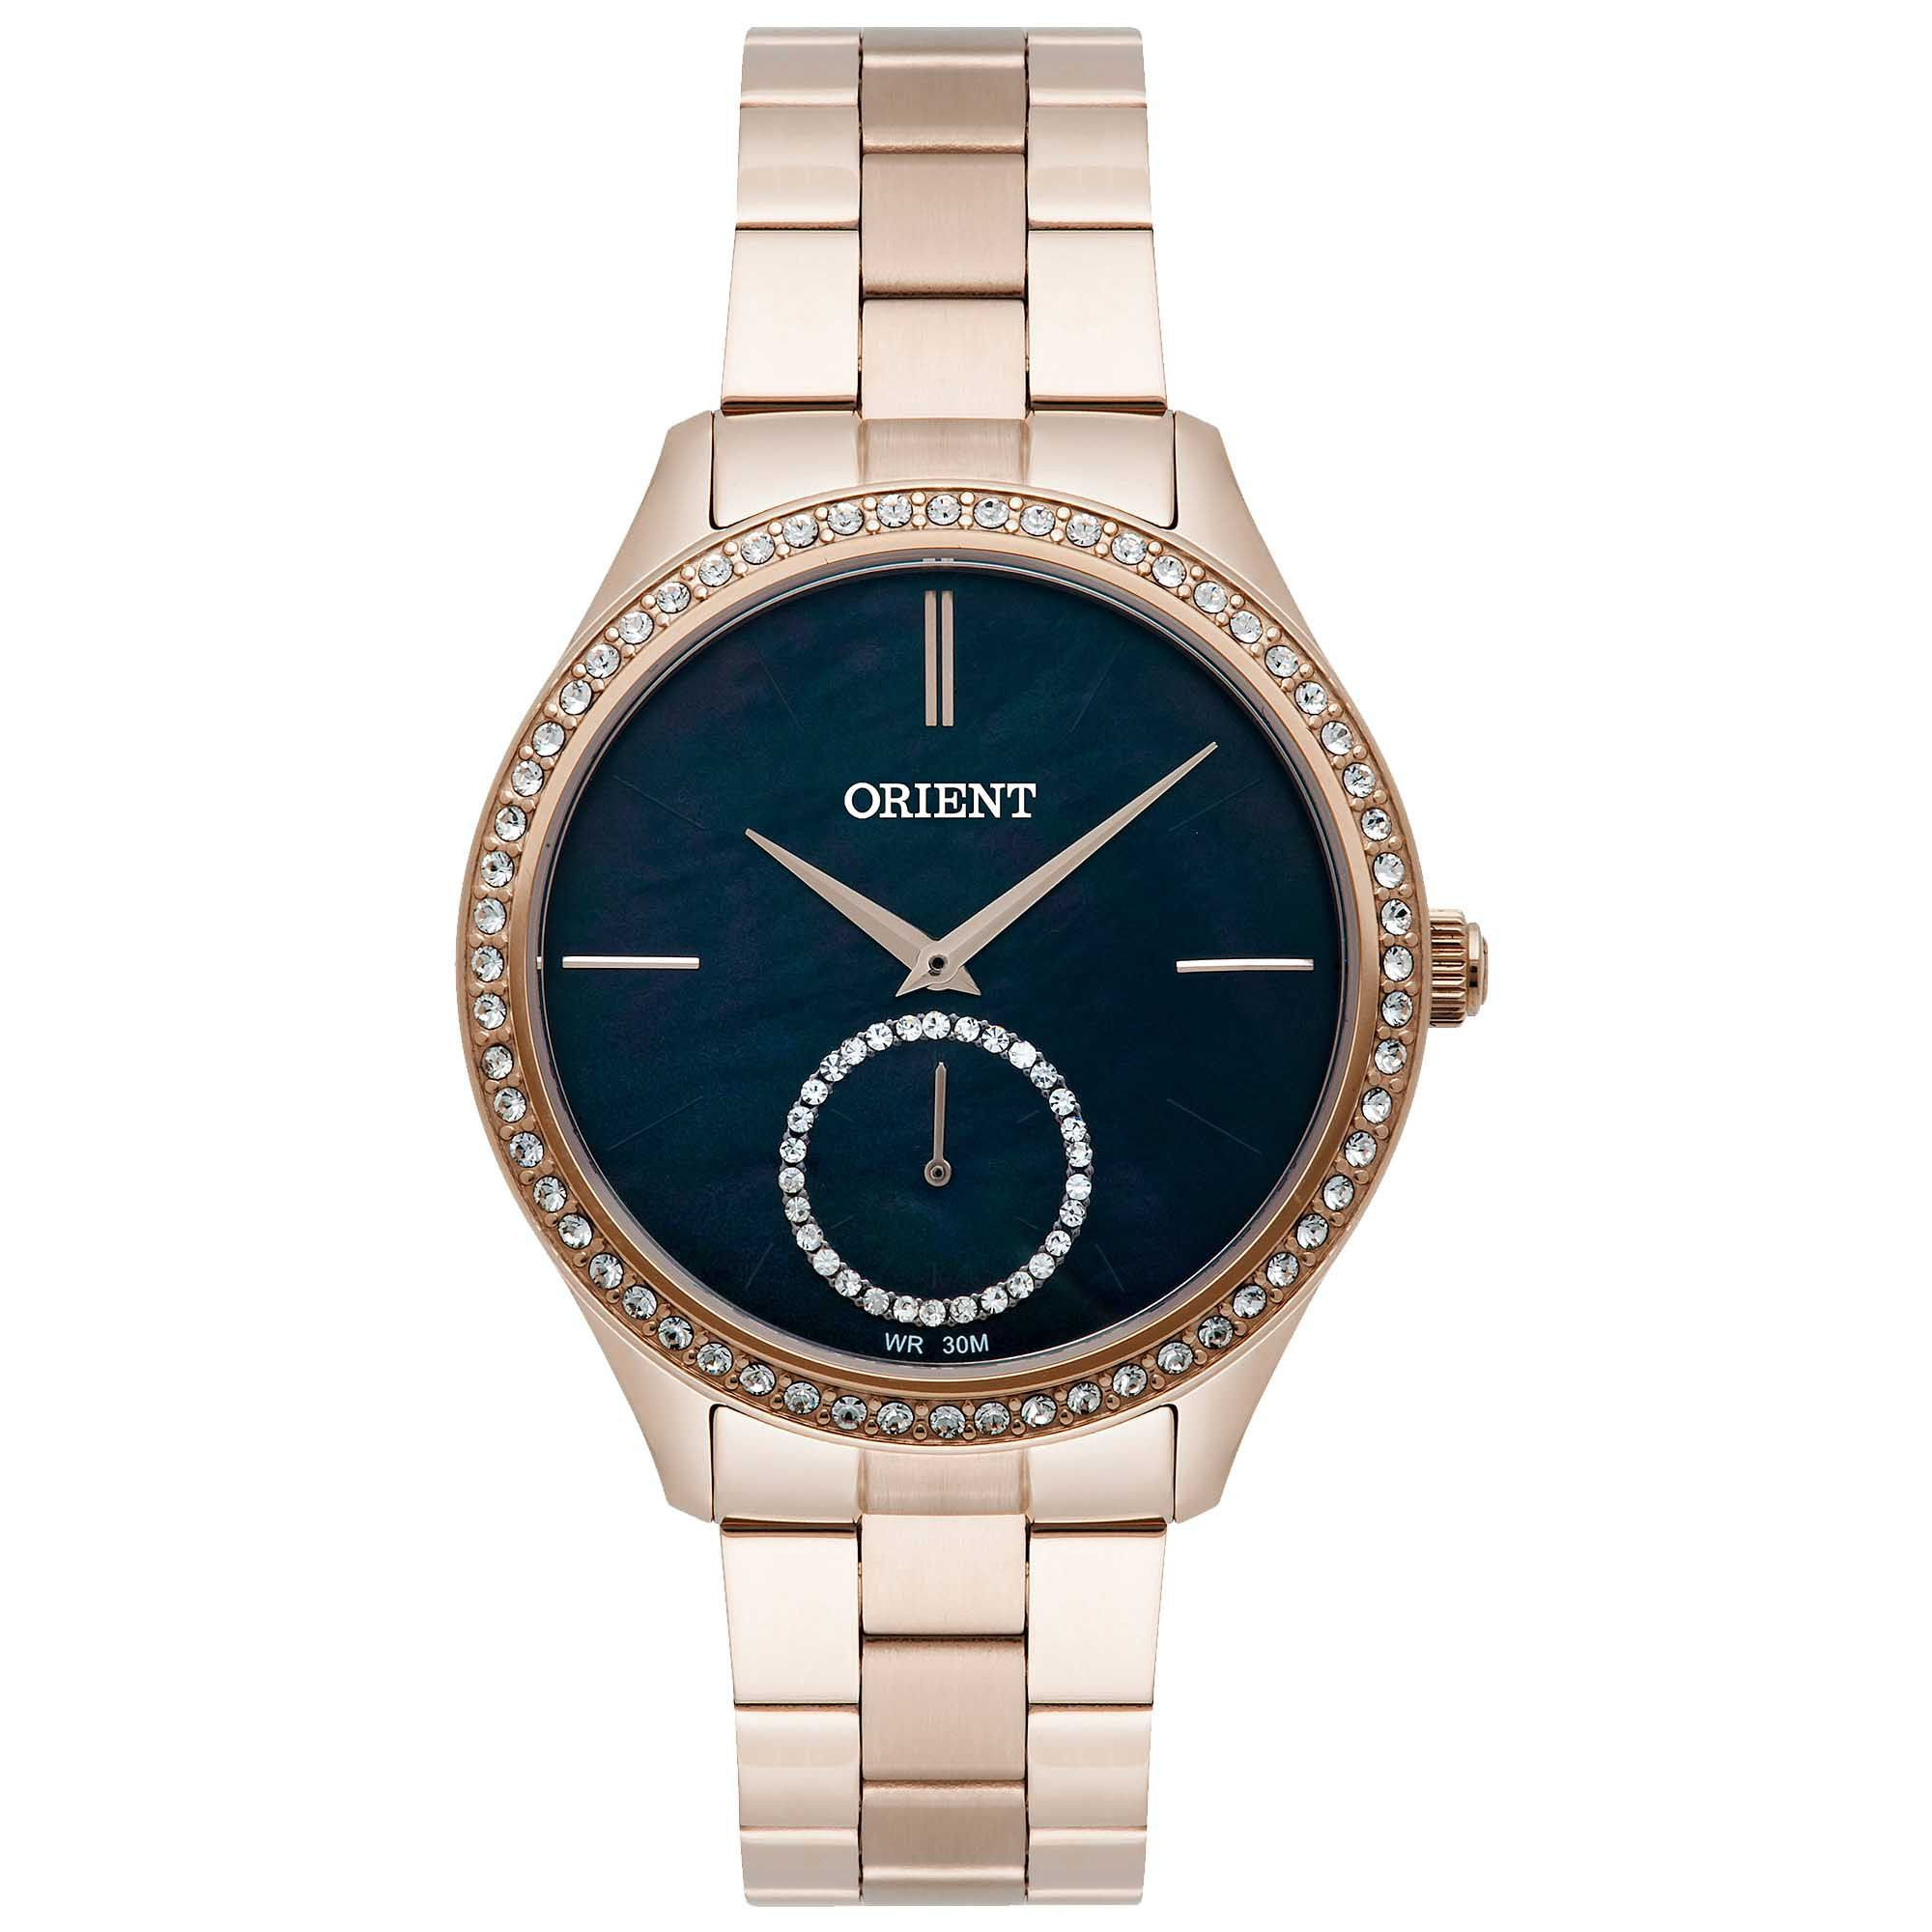 Relógio Feminino Orient FGSS0105 P1KX